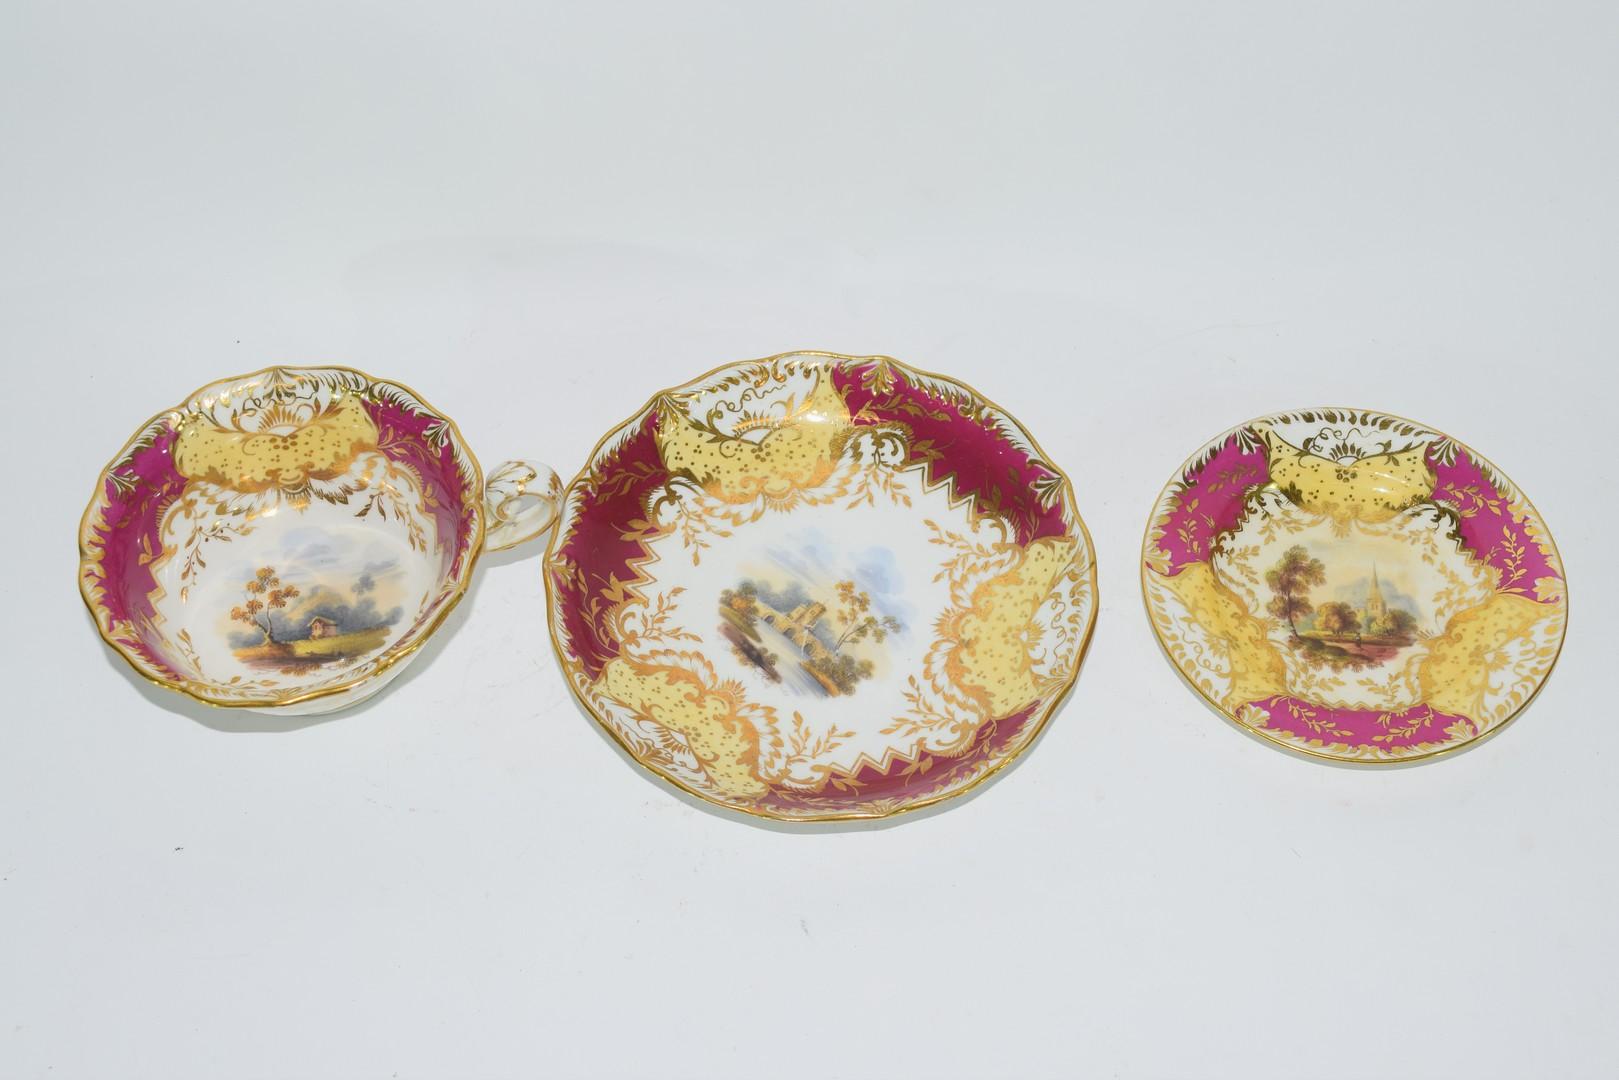 English porcelain trio - Image 2 of 3